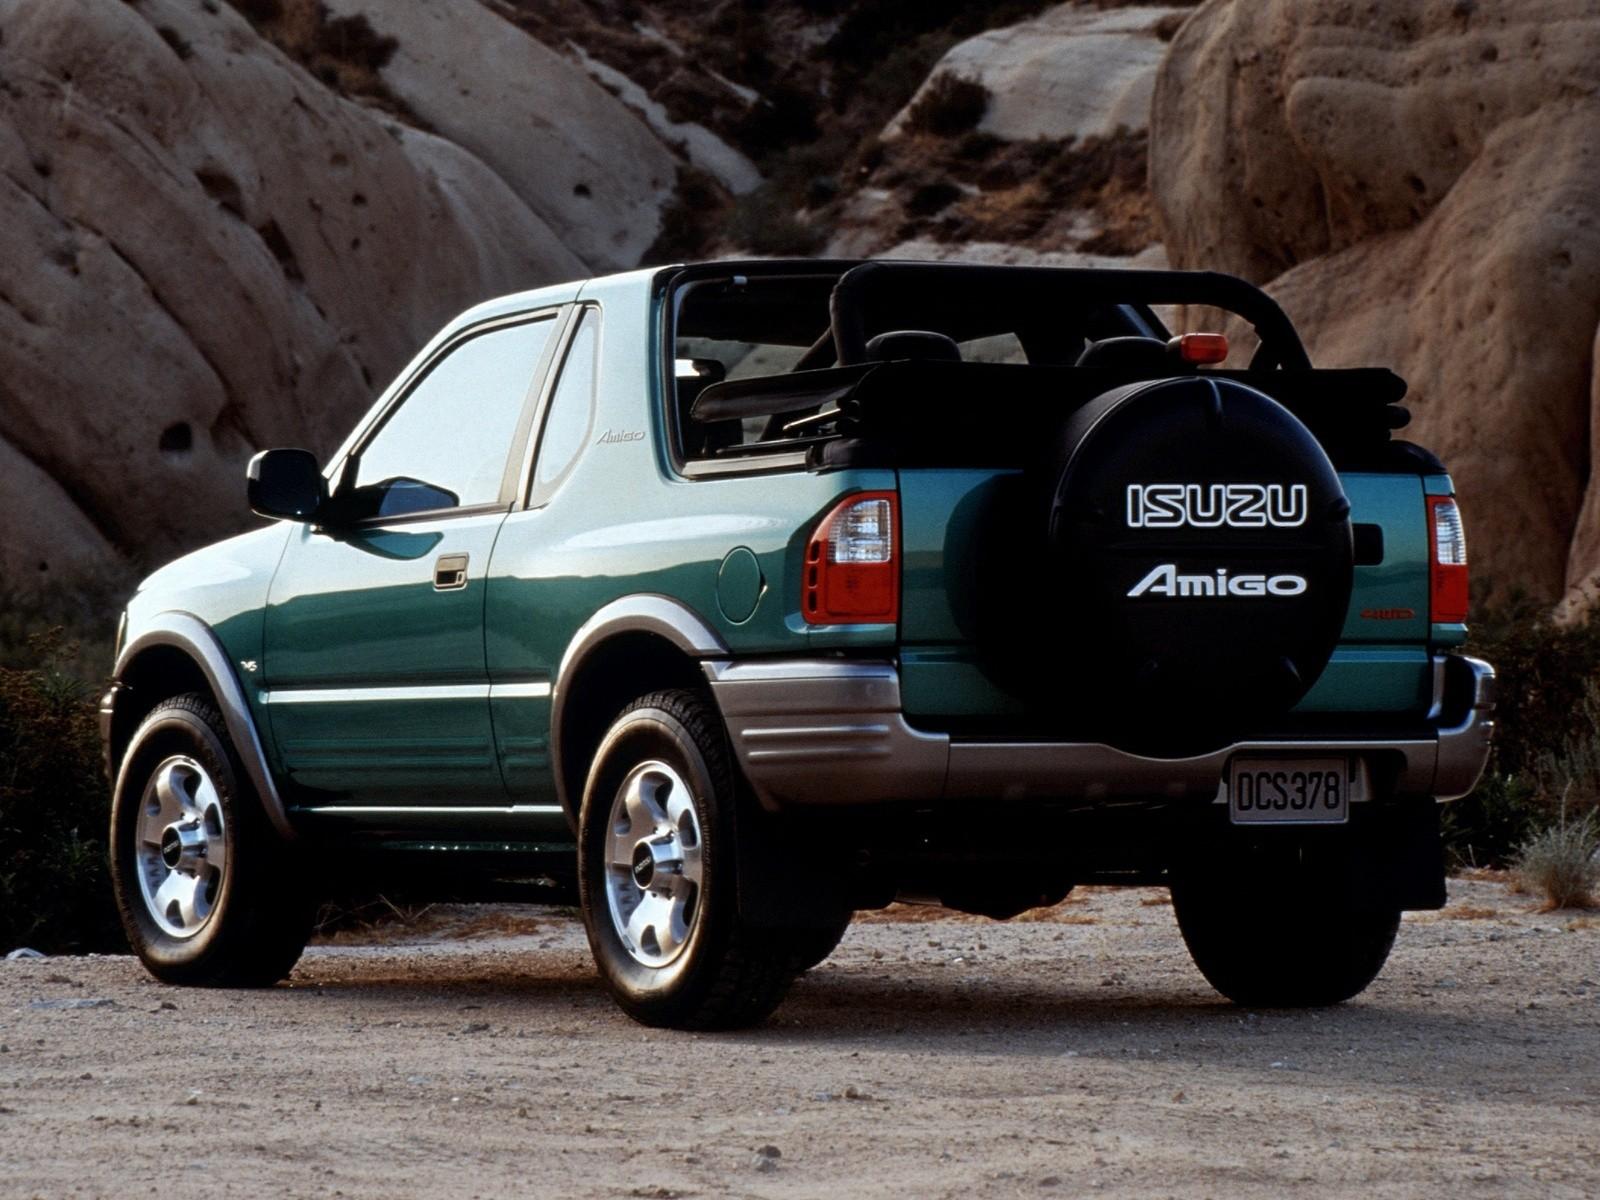 Isuzu Amigo Cabrio on 2001 Jeep S